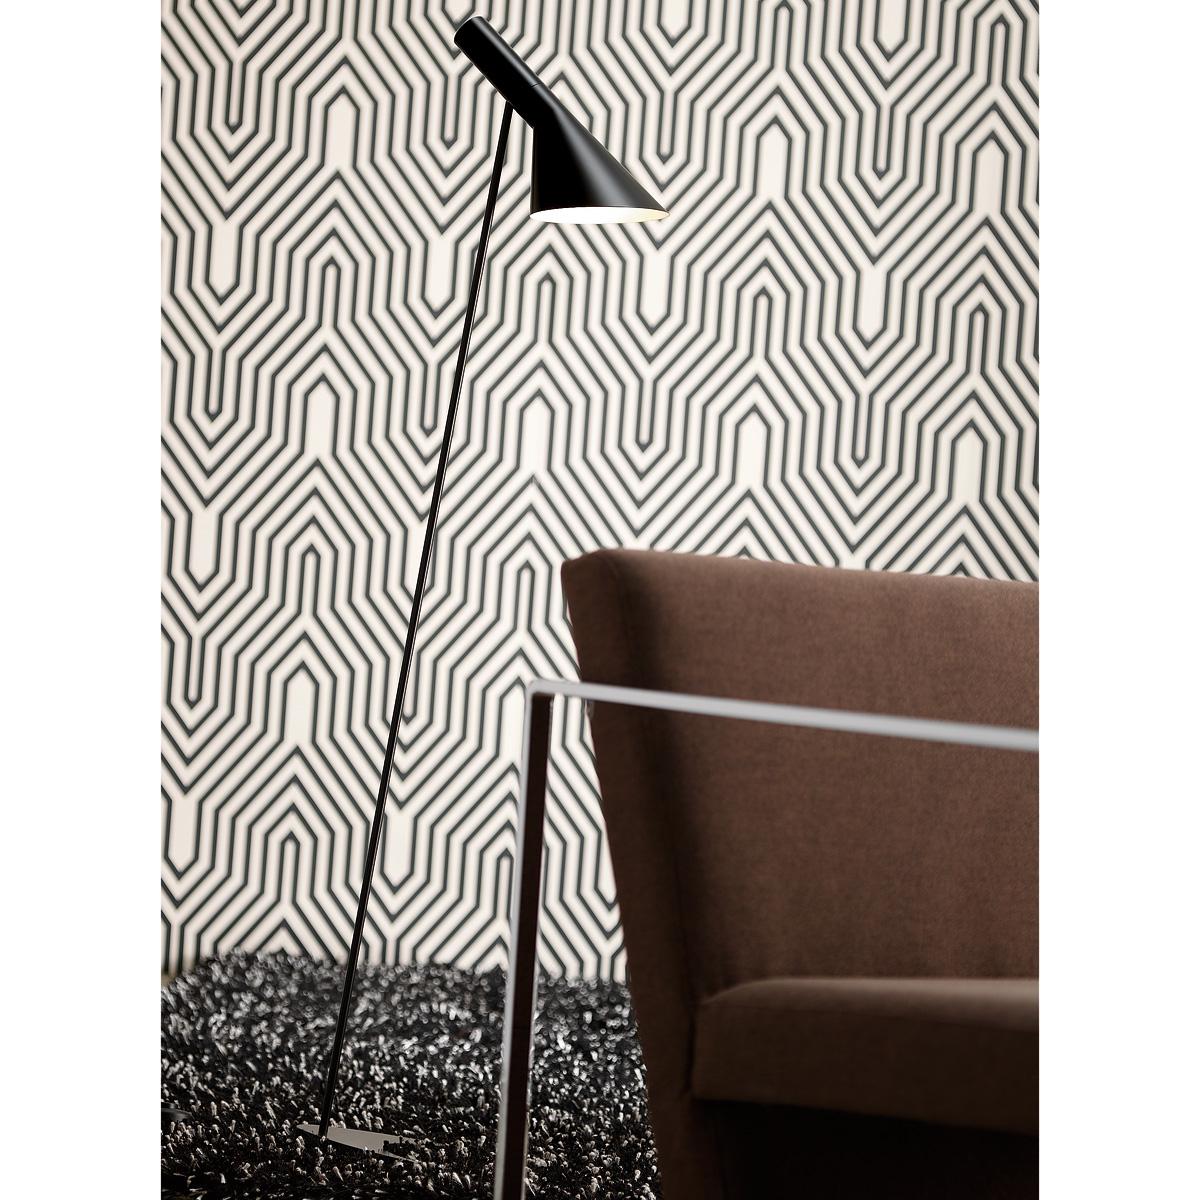 Louis poulsen aj floor lamp pure interior art aj stehleuchte situation 1200x1200 aj floor ambiente 1200x1200 parisarafo Gallery